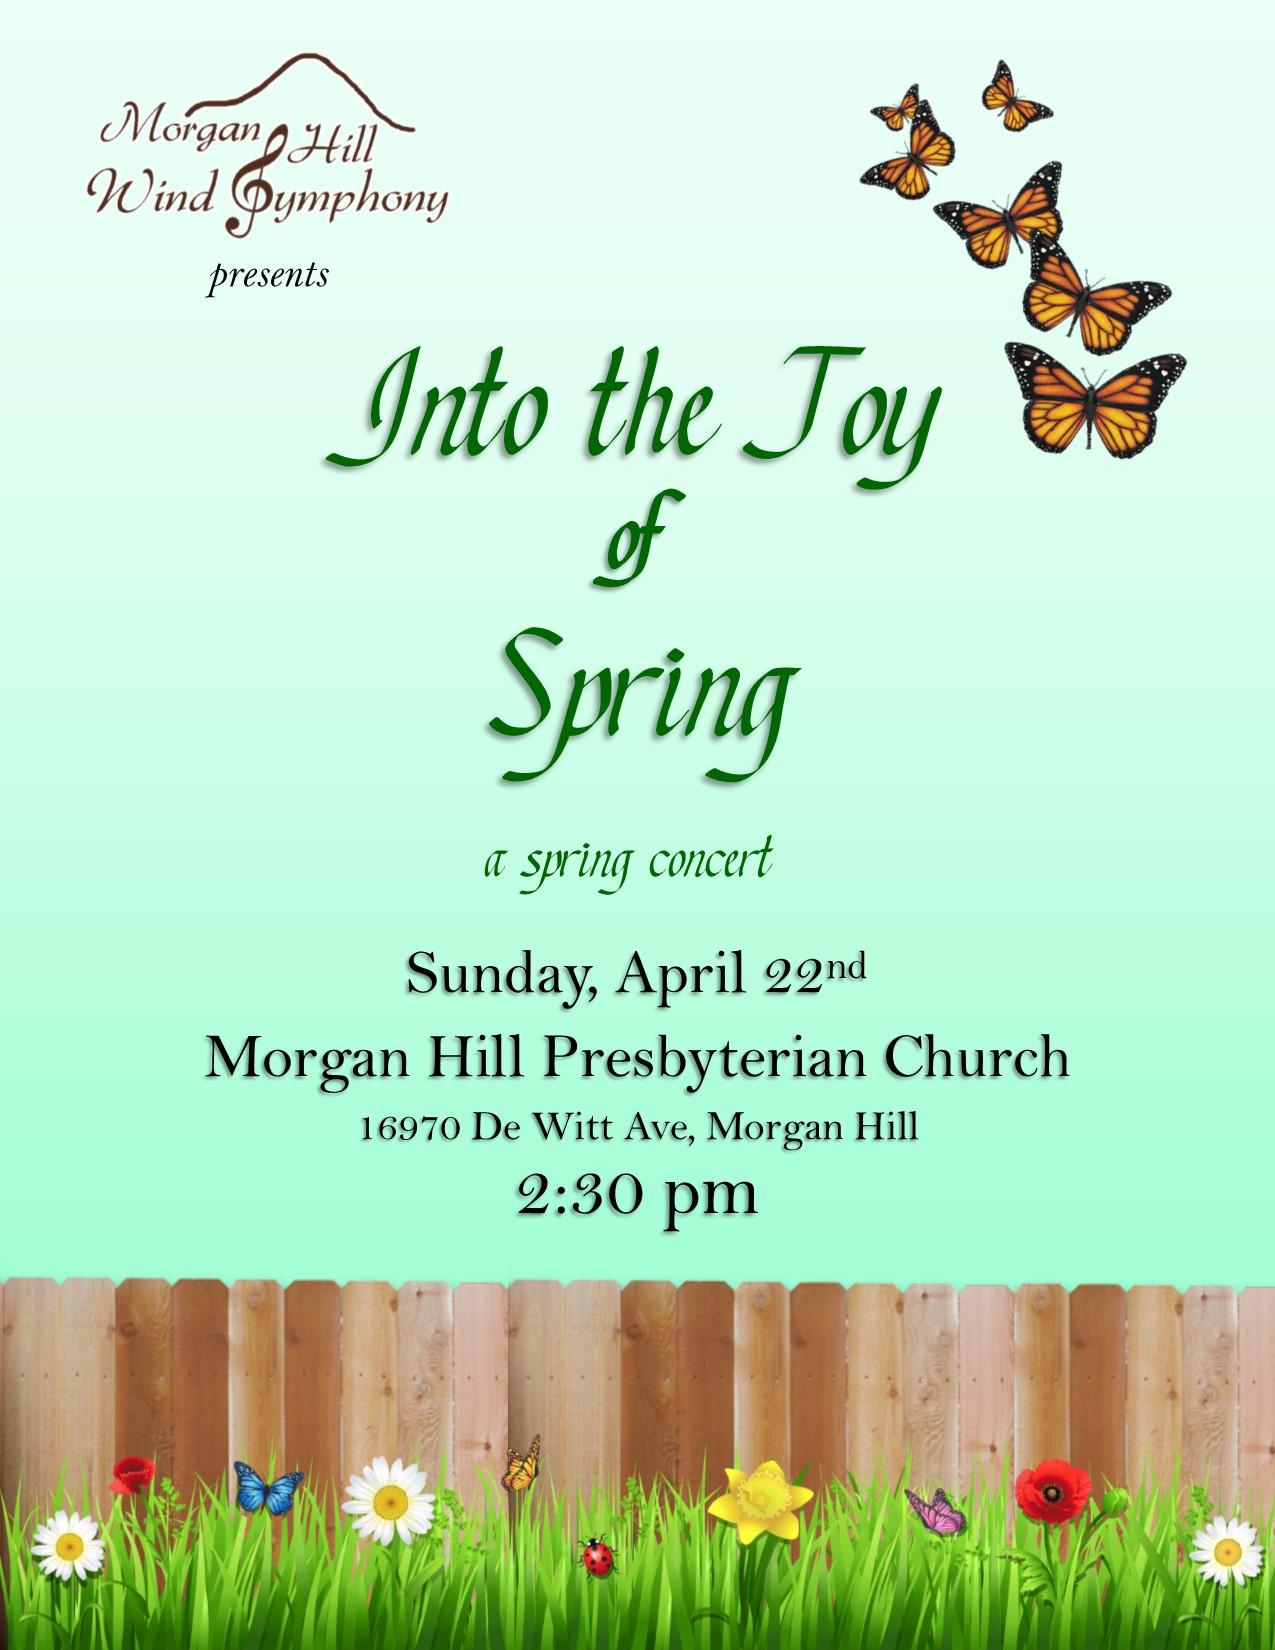 Into the Joy of Spring - Sunday, April 22nd, 2018 at 2:30 PMMorgan Hill Presbyterian Church16970 De Witt Ave, Morgan Hill